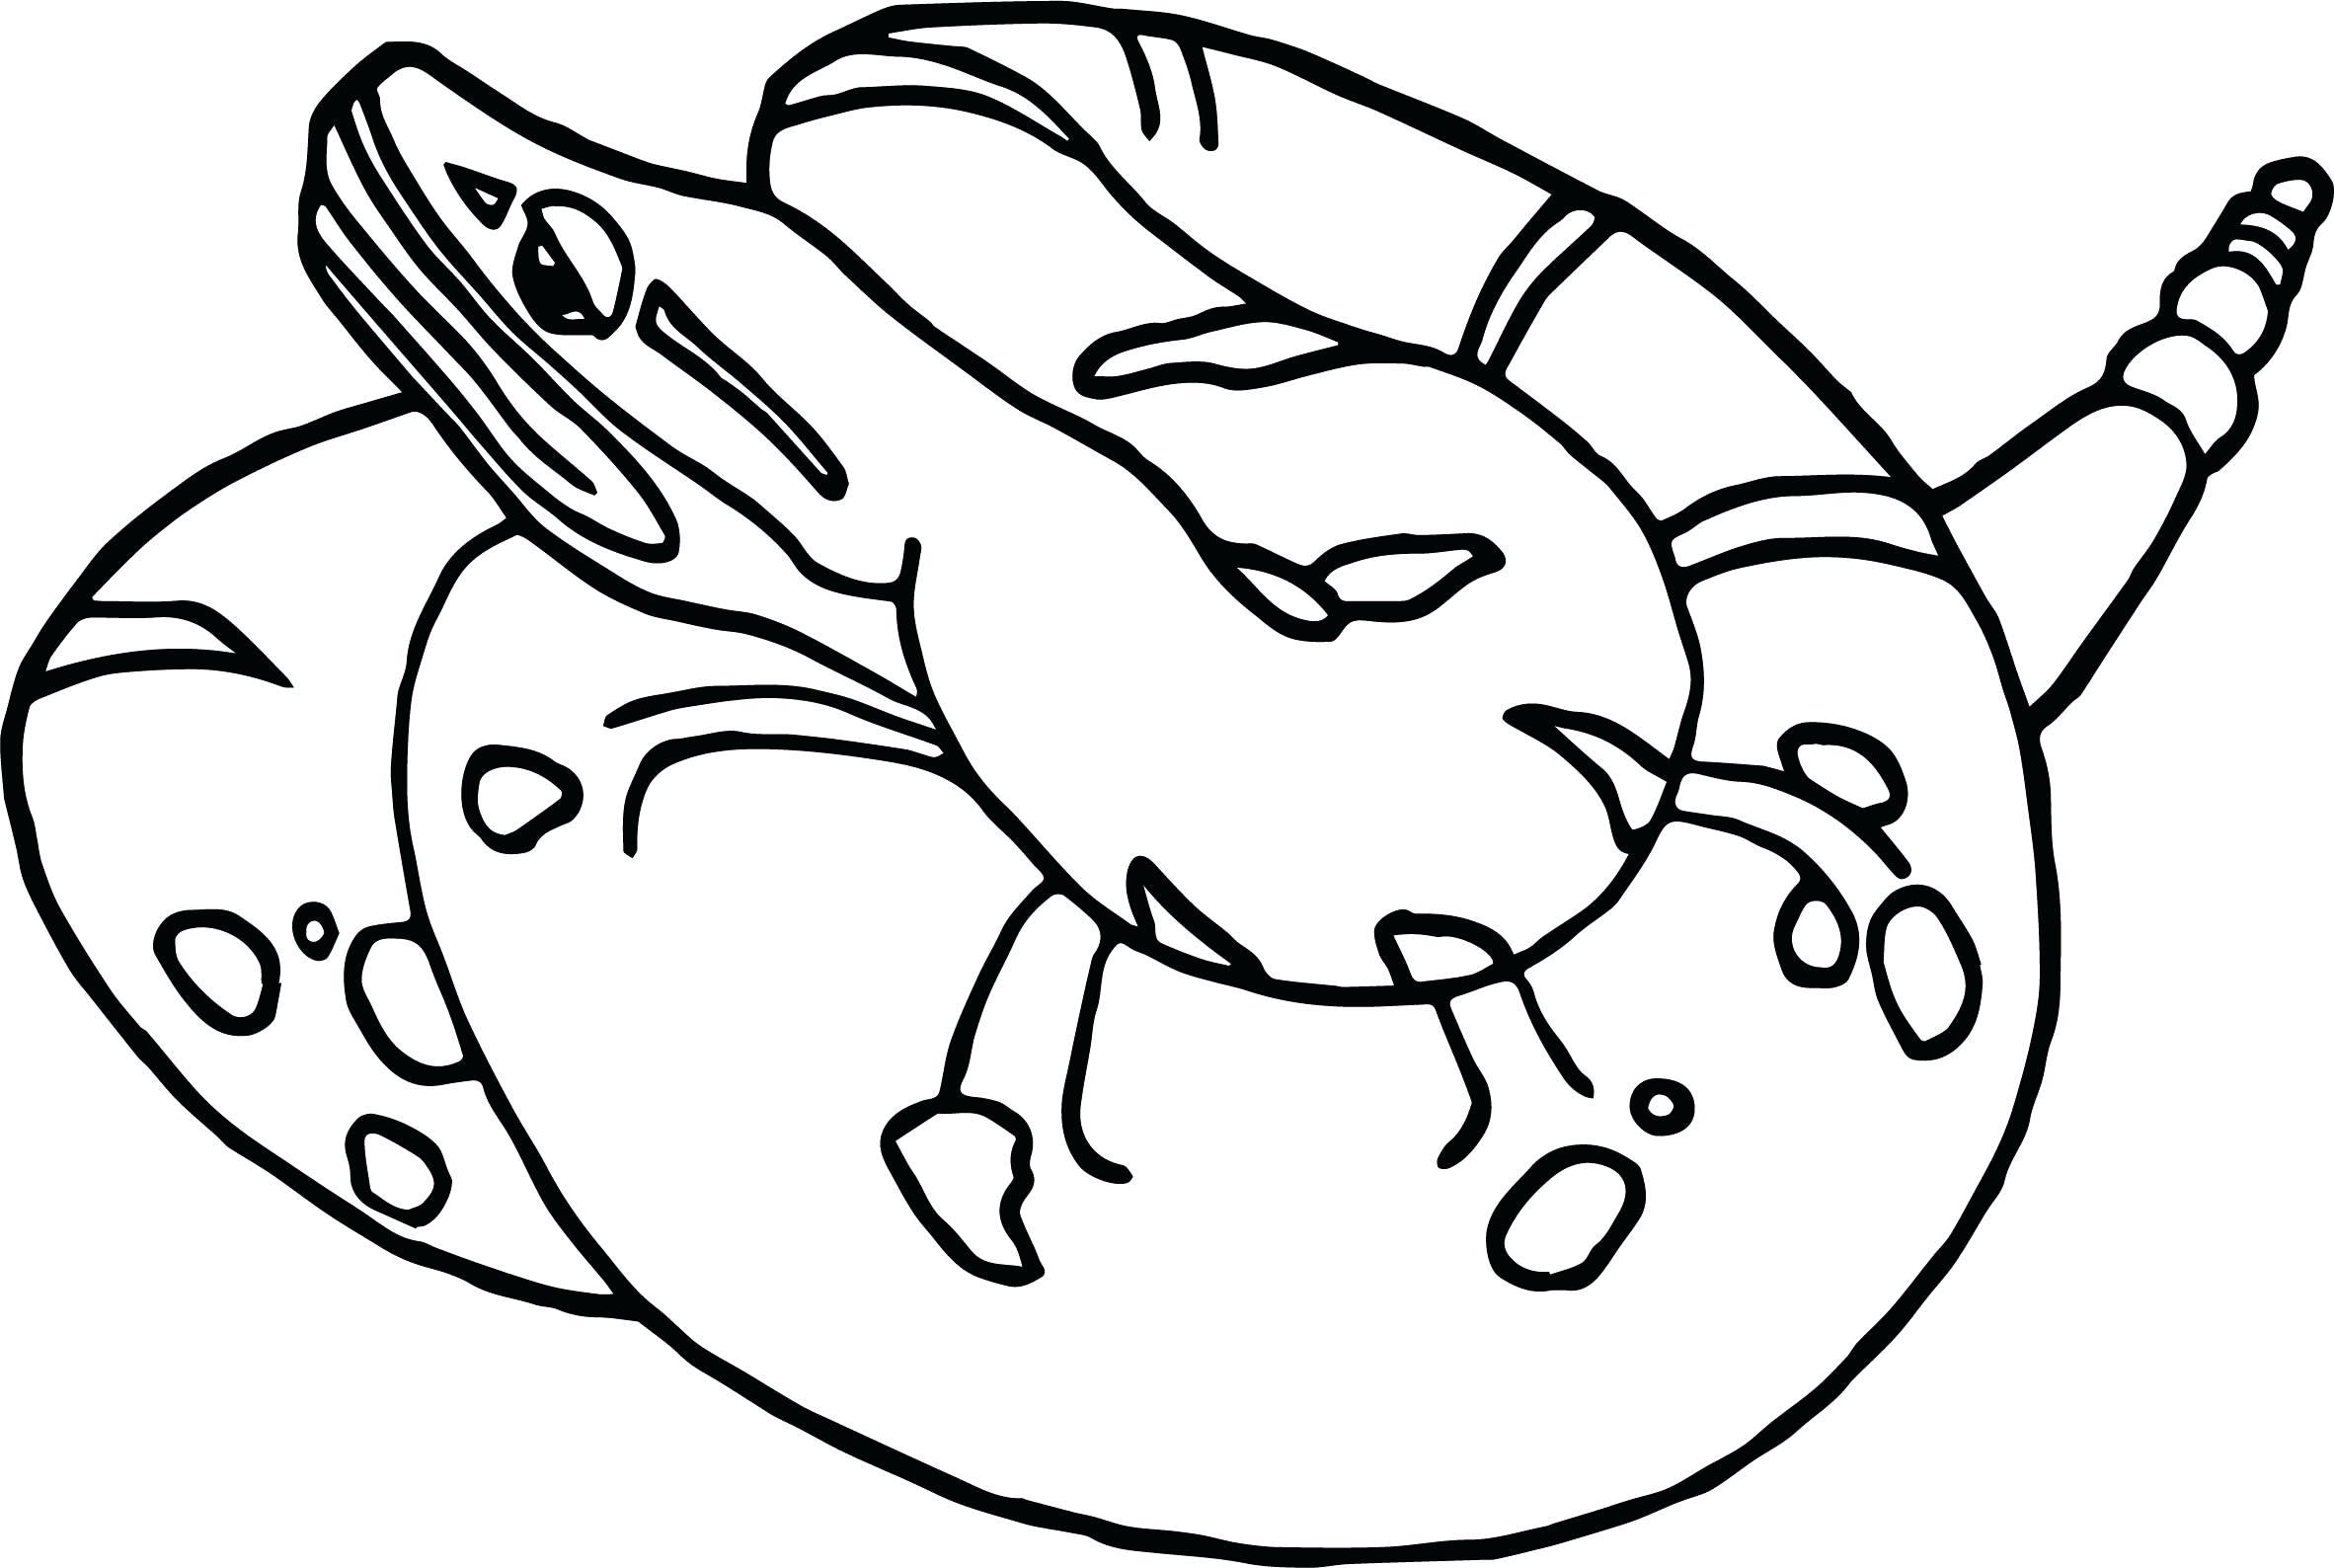 Cesar Chavez Drawing At Getdrawings